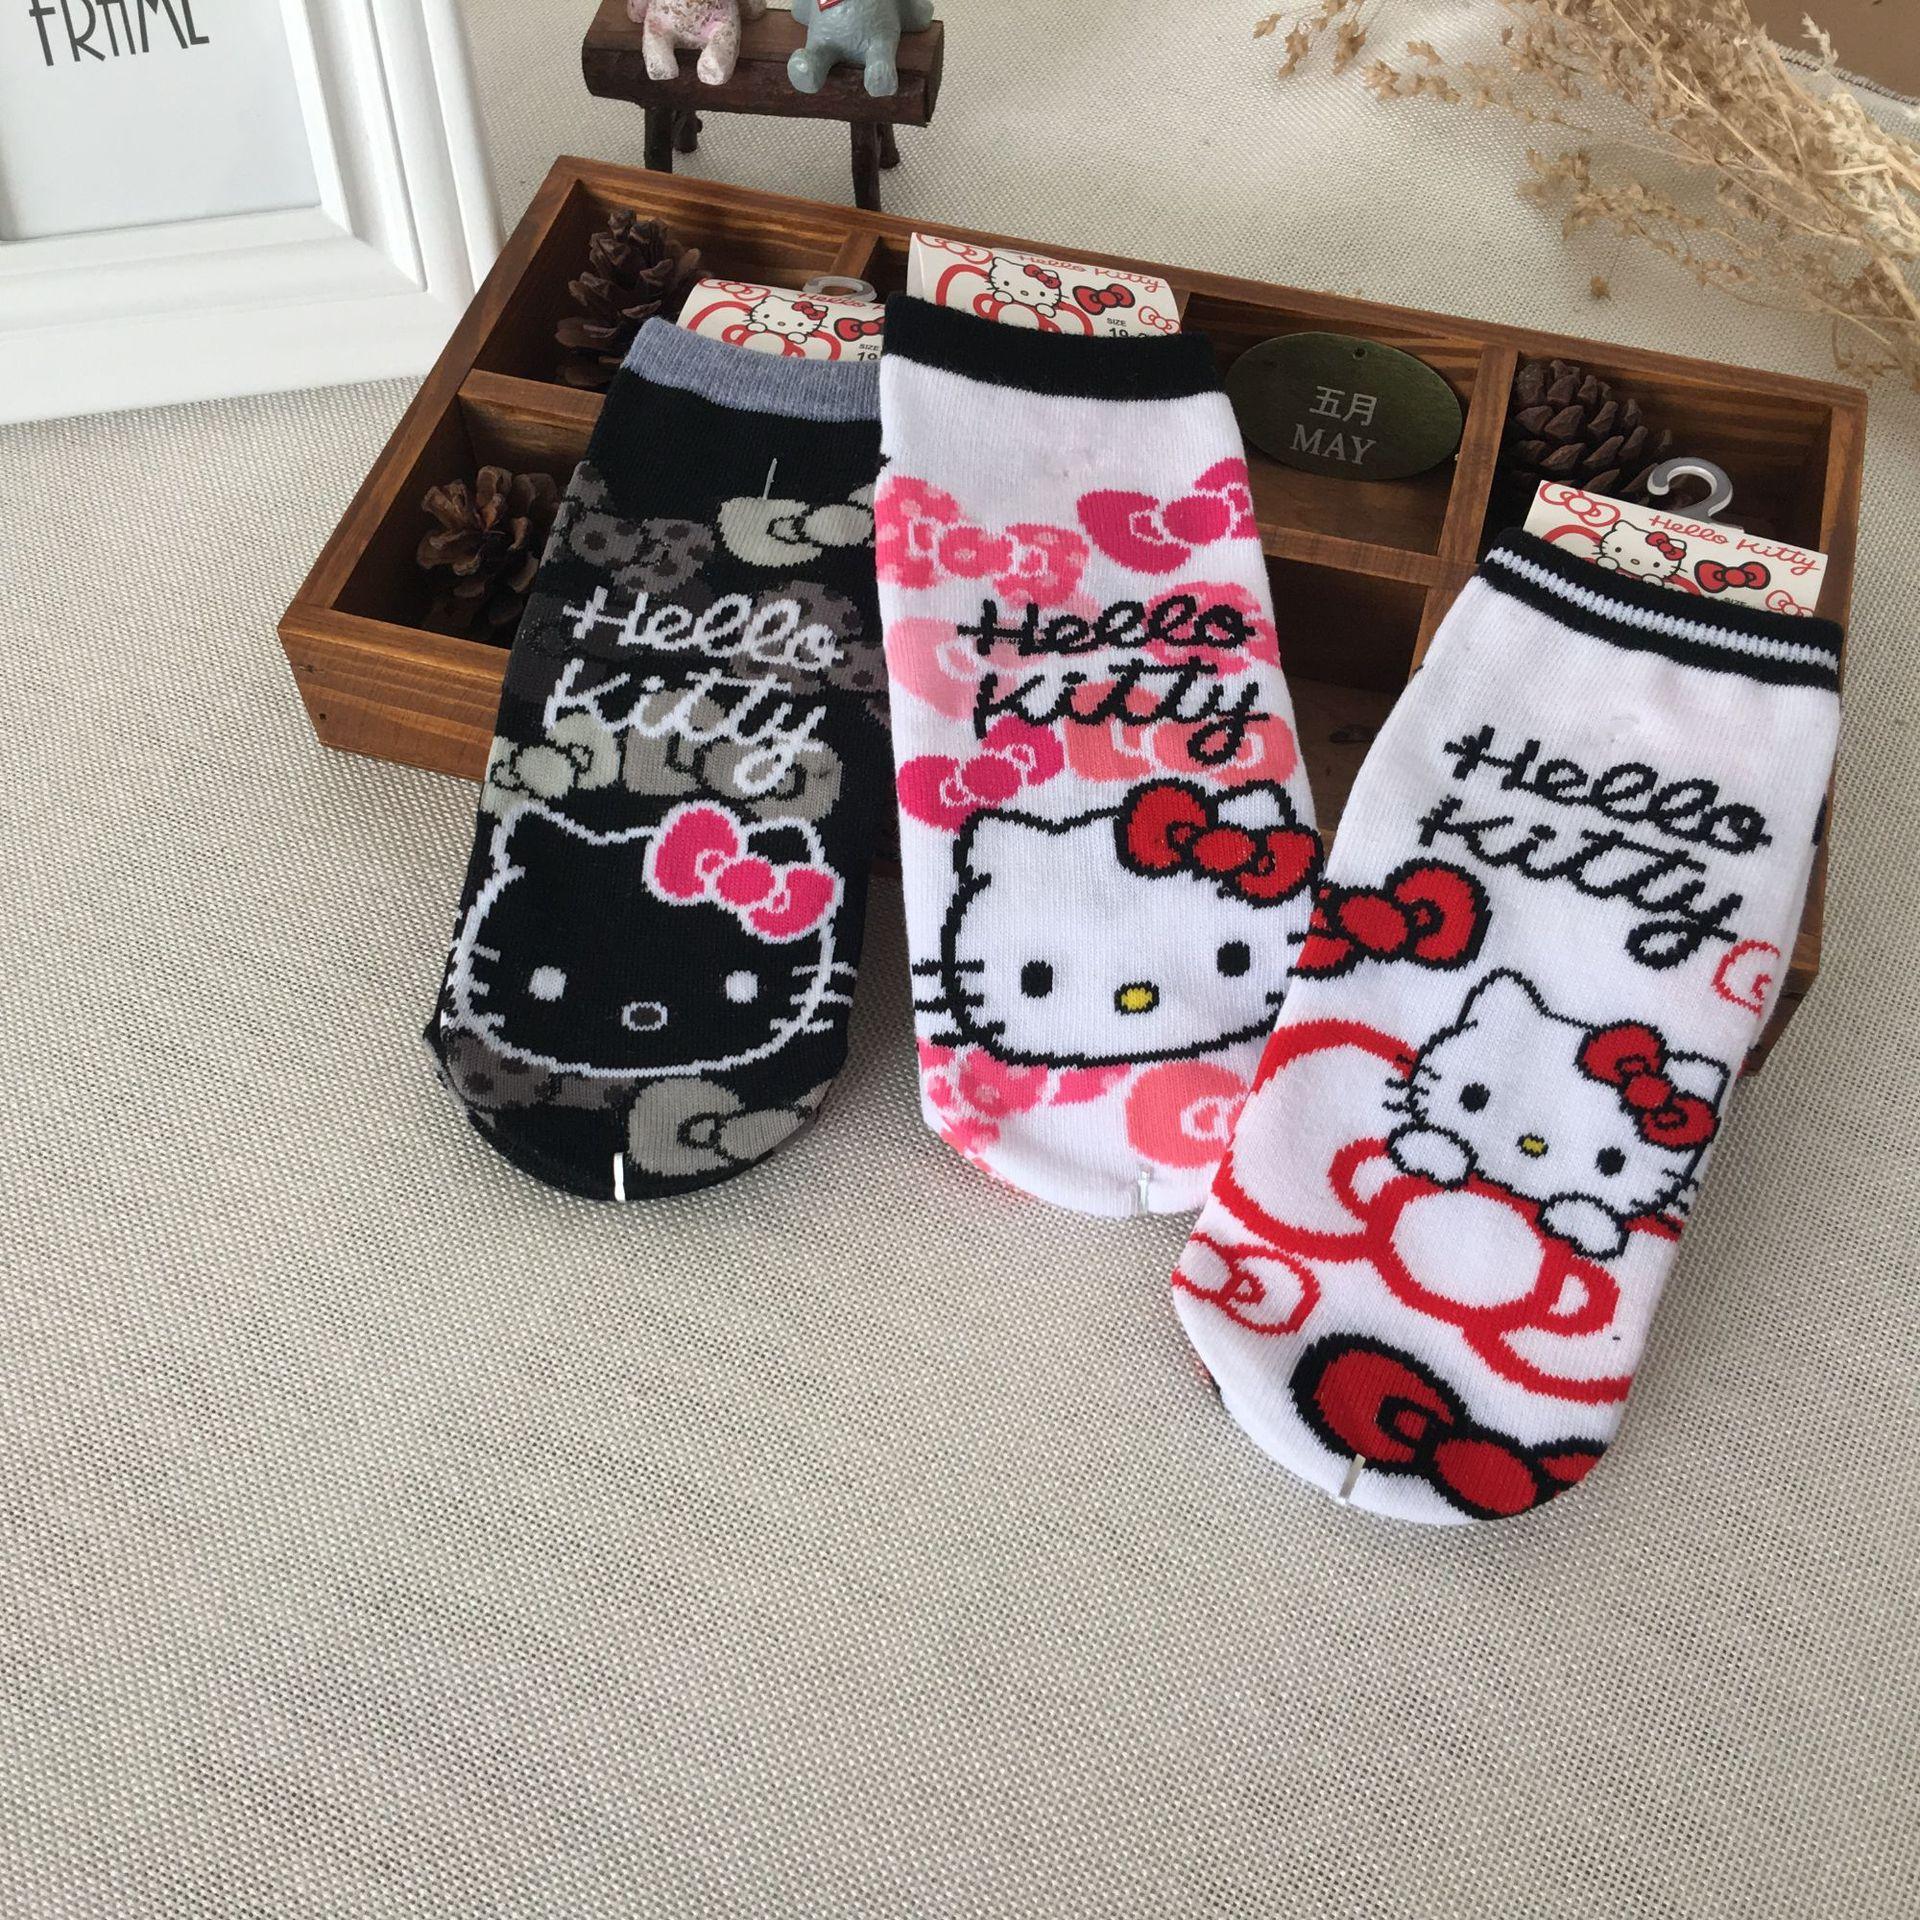 Cartoon Hello Kitty Women   Socks   Casual Funny Cute Kitten Stitching Pattern Cotton   Socks   Harajuku Kawaii Animal Print Cozy   Socks